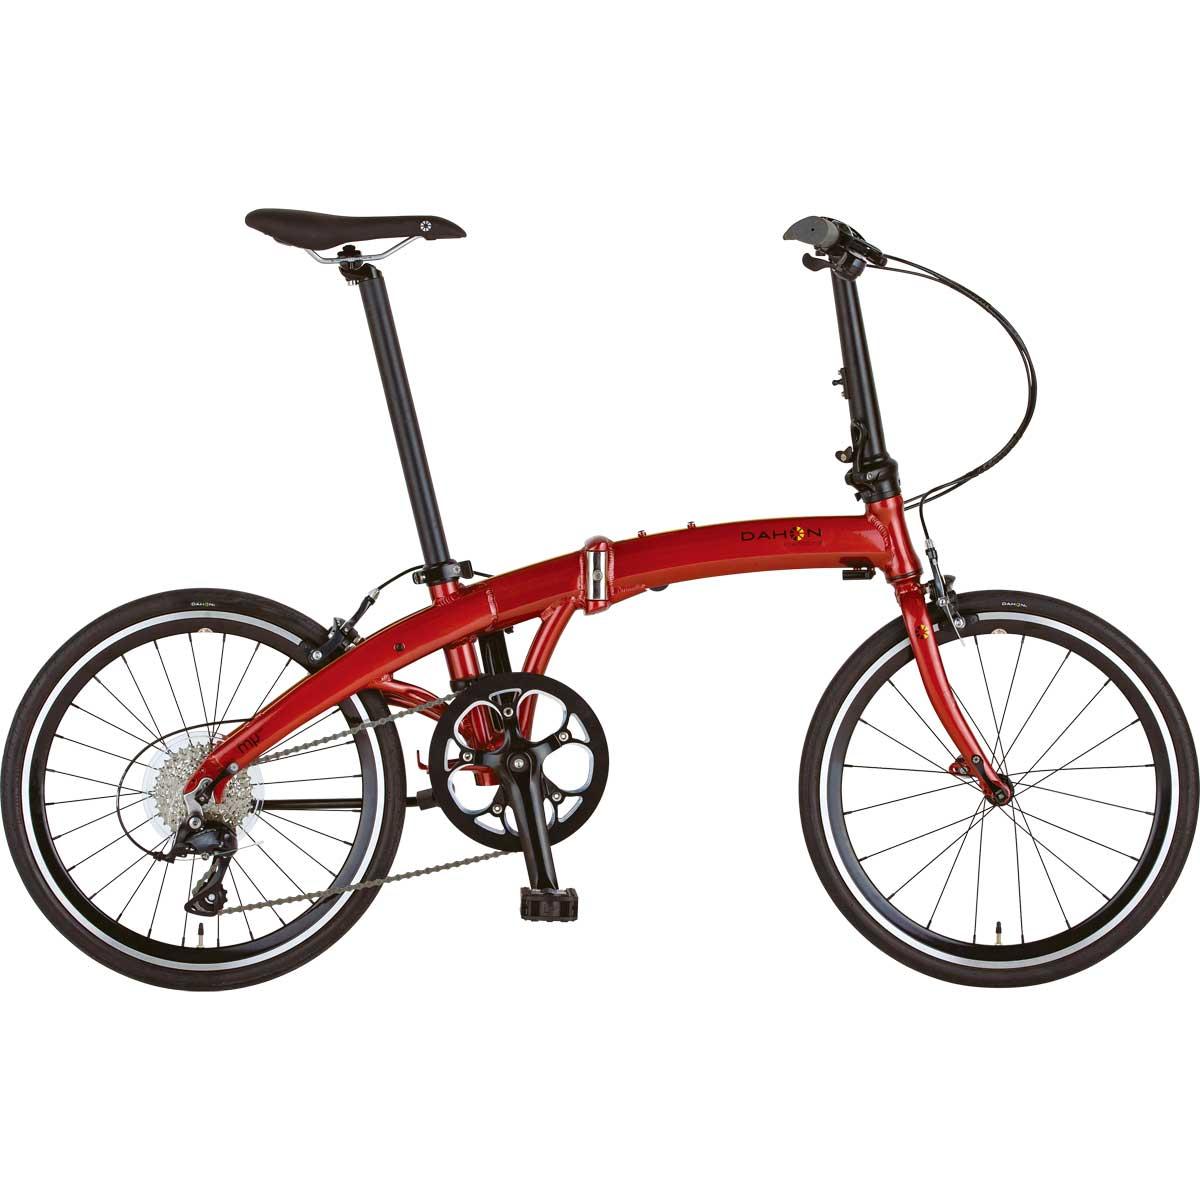 DAHON/ダホン Mu SP9 ミュー SP9 カーディナルレッド(9016) 折りたたみ自転車 自転車本体